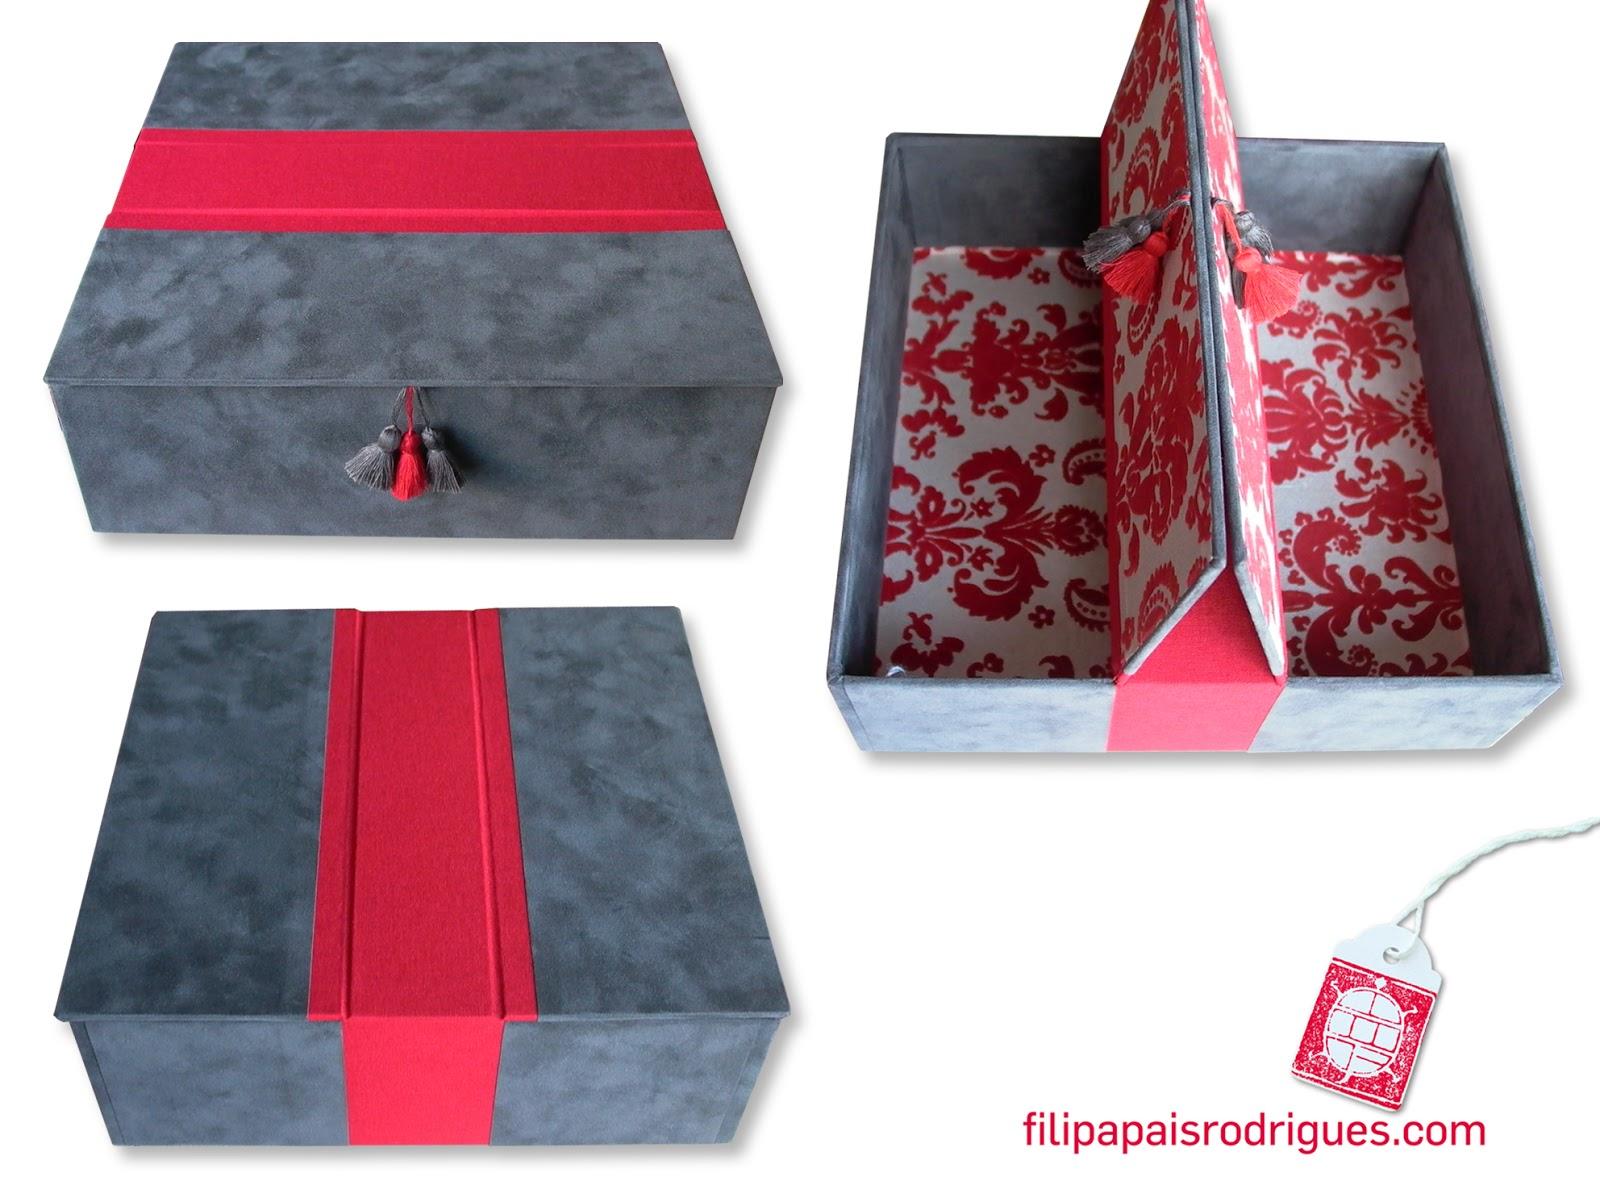 filipa pais rodrigues double vide poche. Black Bedroom Furniture Sets. Home Design Ideas